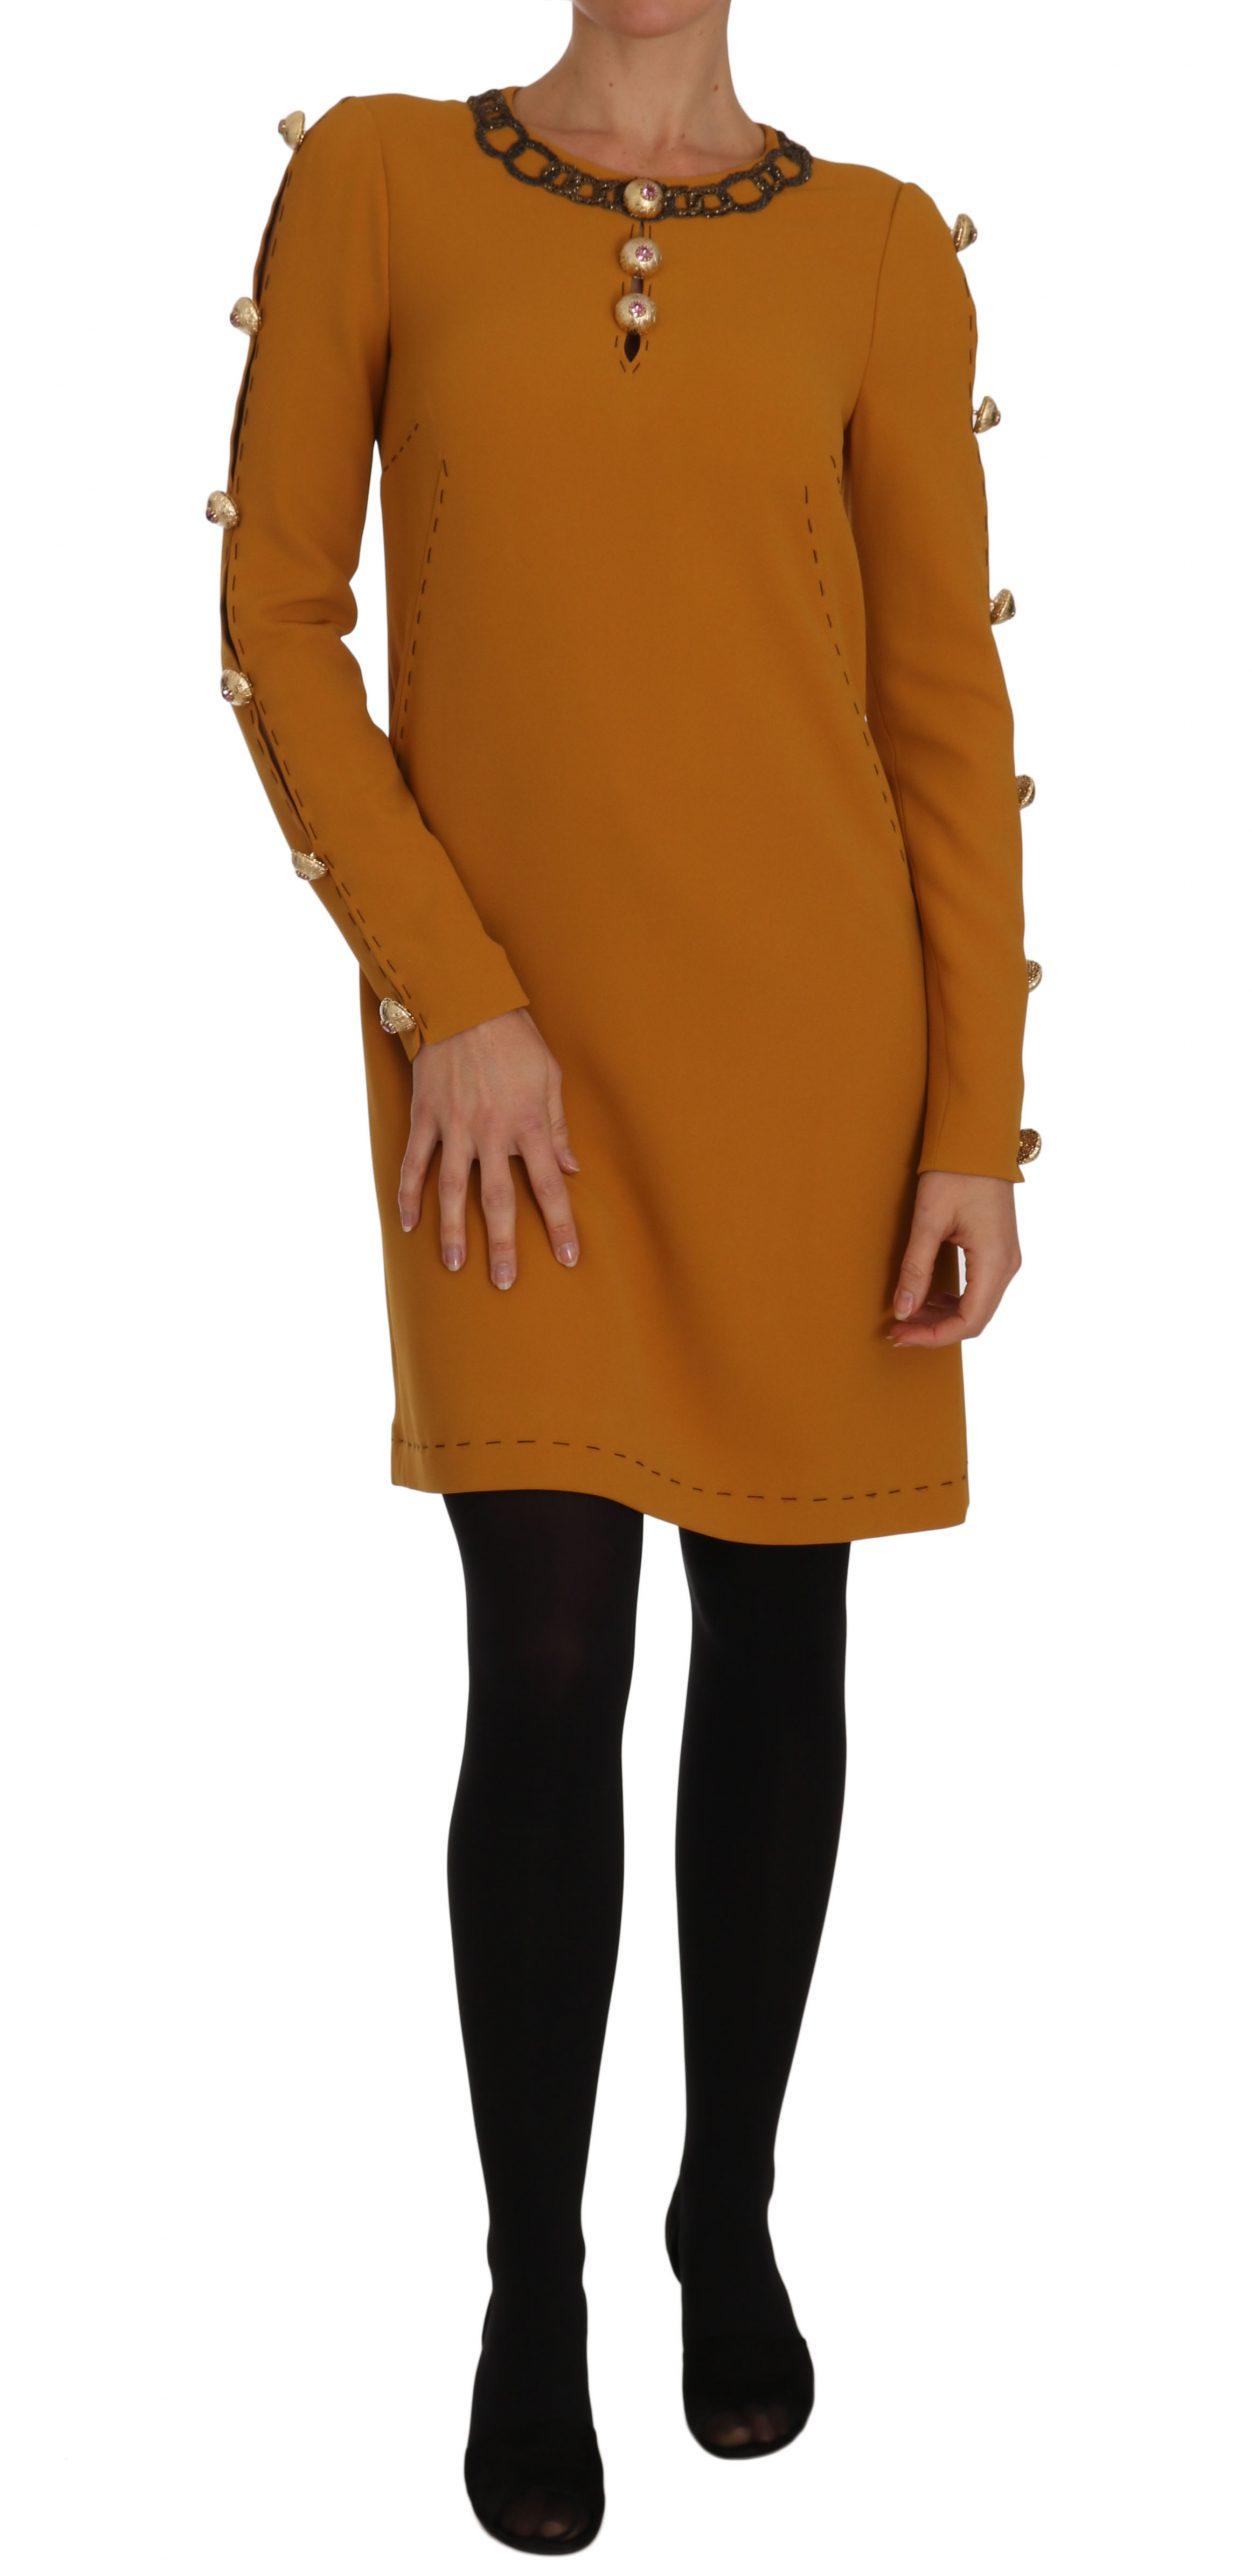 Dolce & Gabbana Women's Mini Crystal Embellished Dress Brown DR1469 - IT40|S